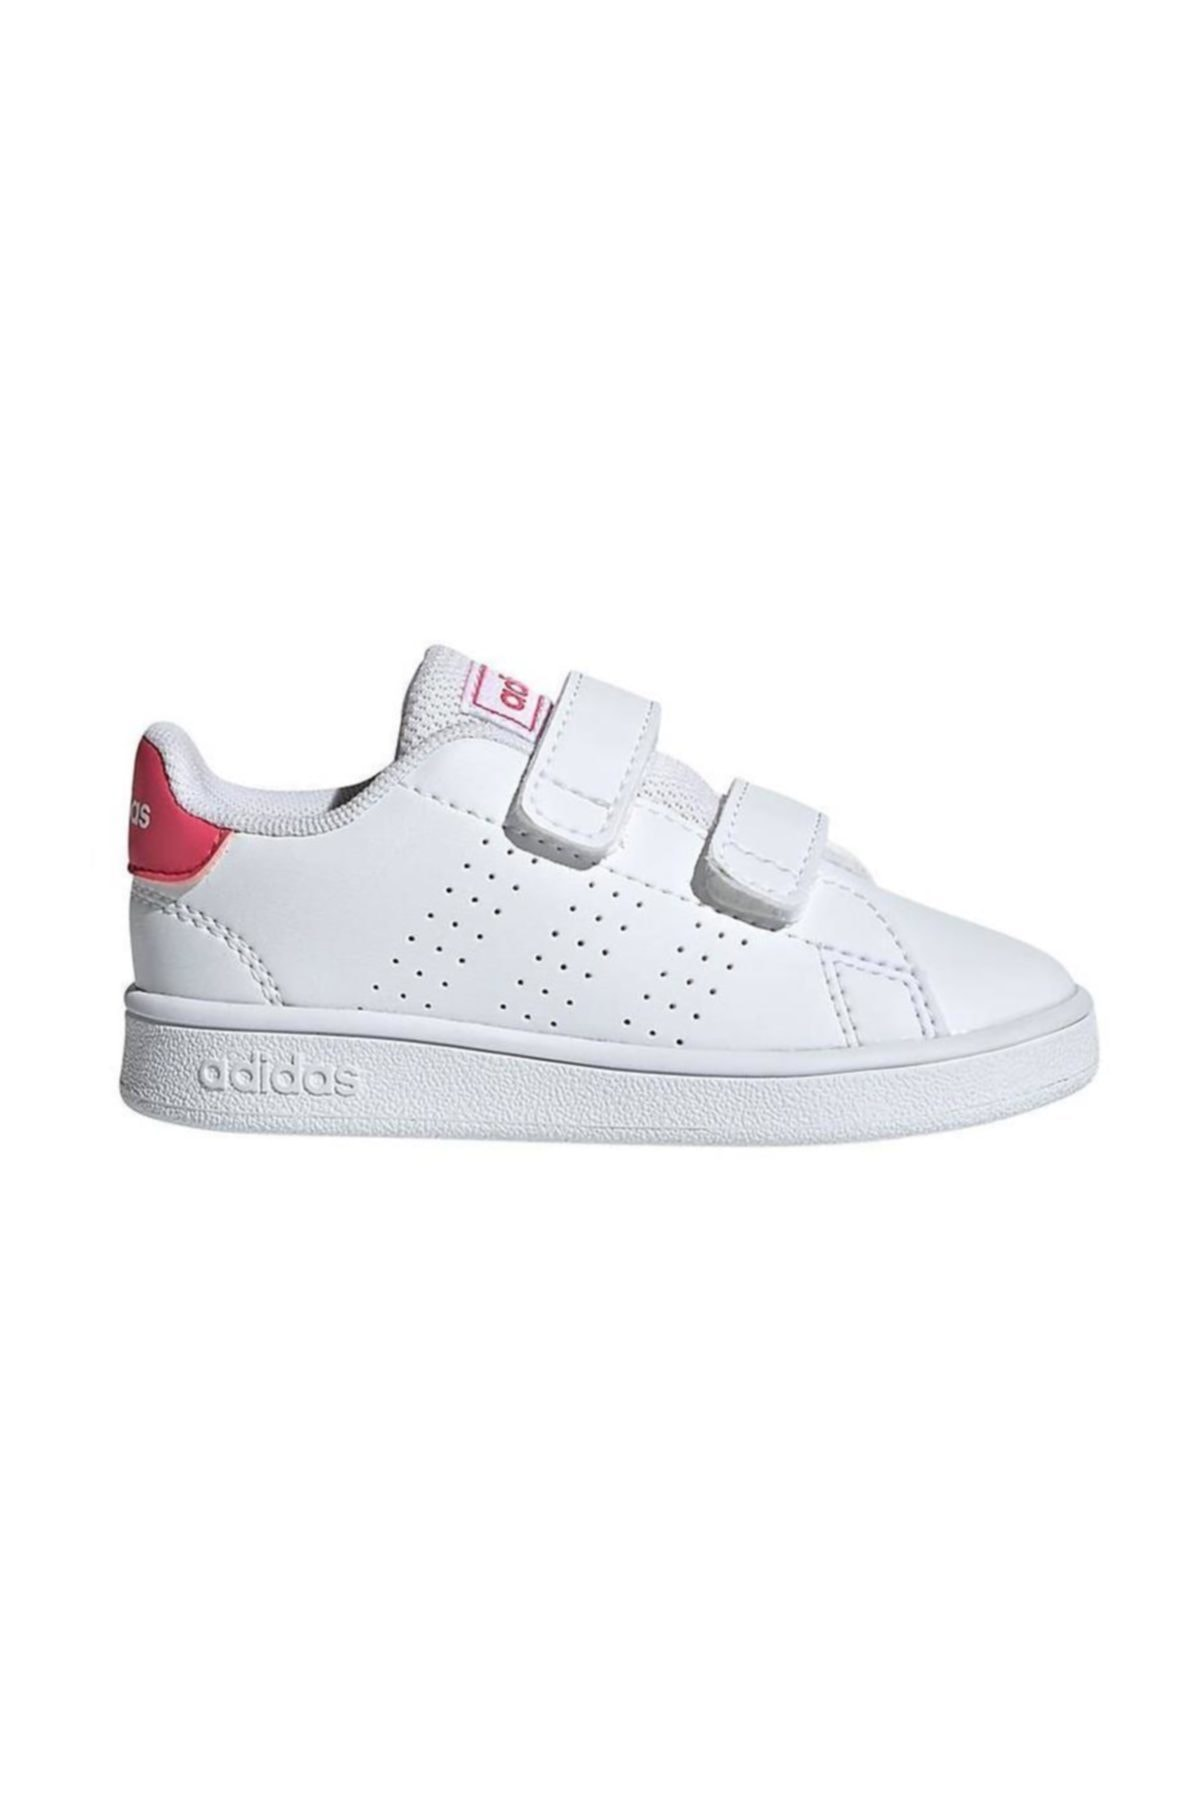 adidas ADVANTAGE Pembe Kız Çocuk Sneaker Ayakkabı 100536371 1